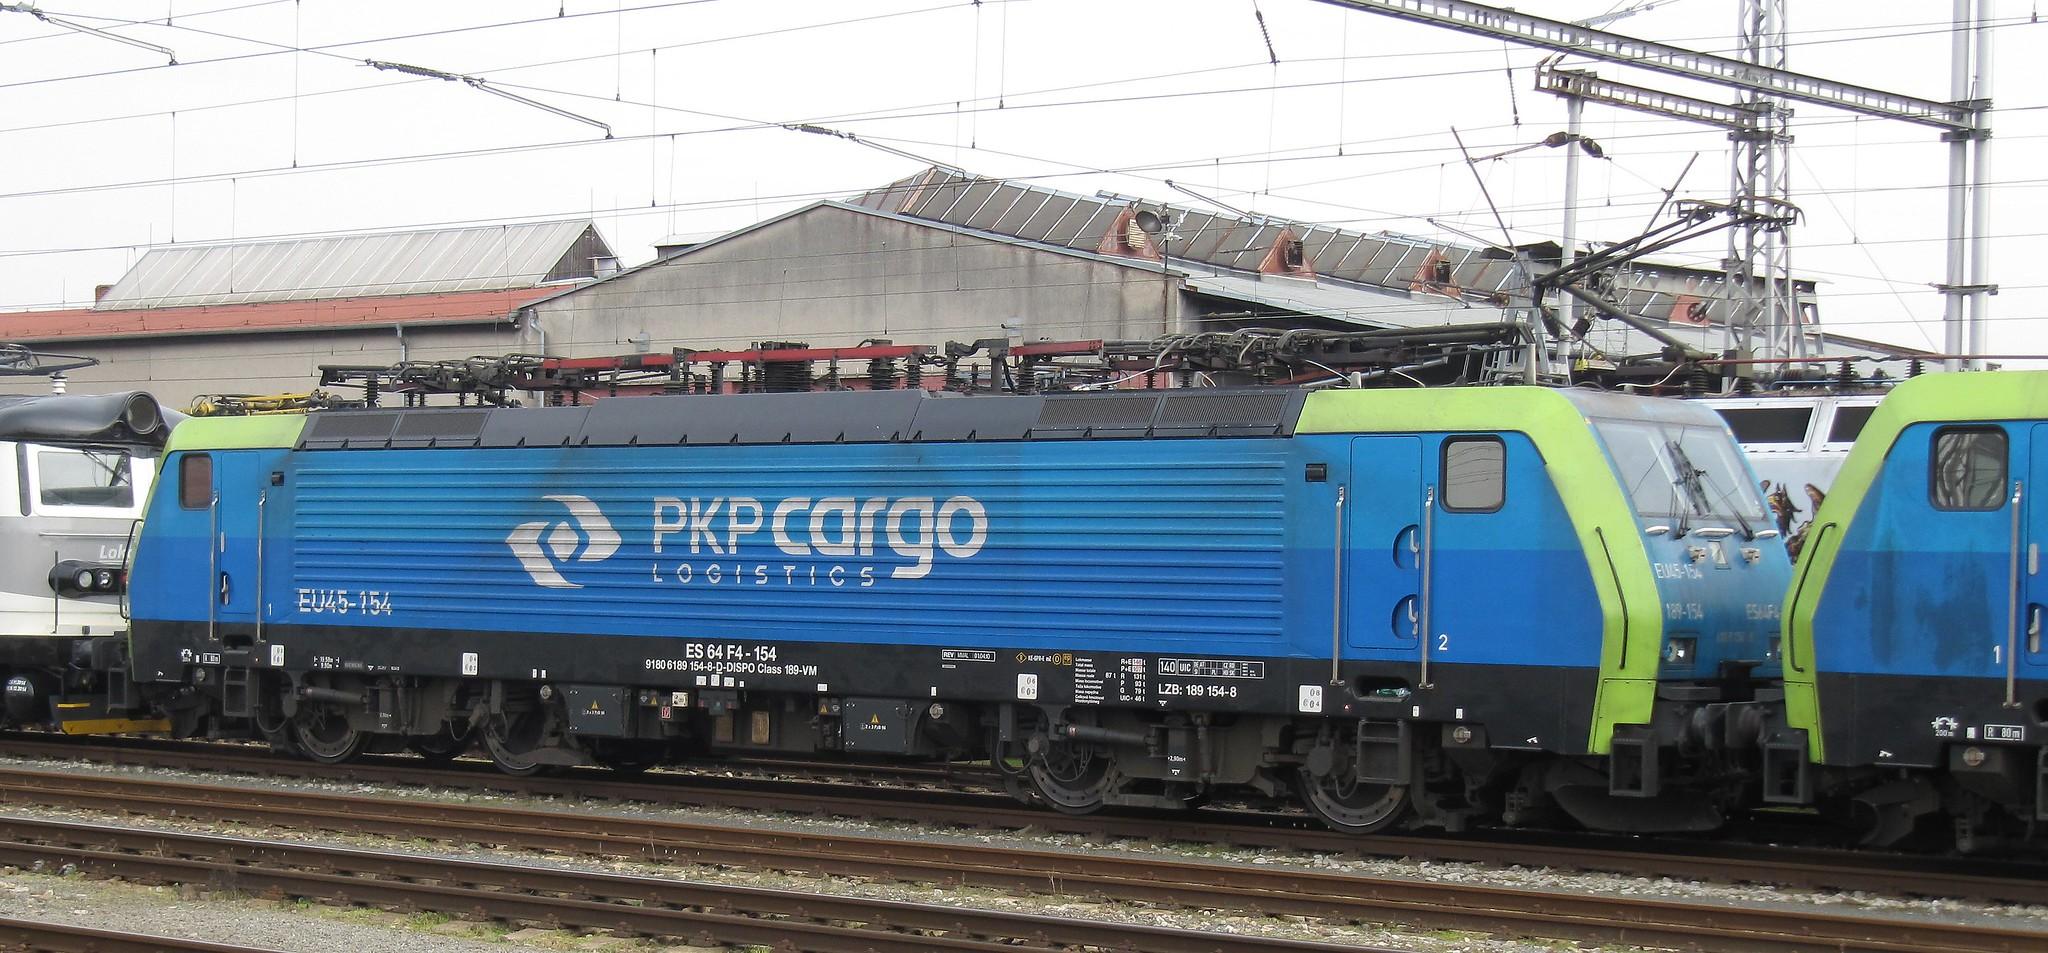 PKP Cargo Railfreight hub